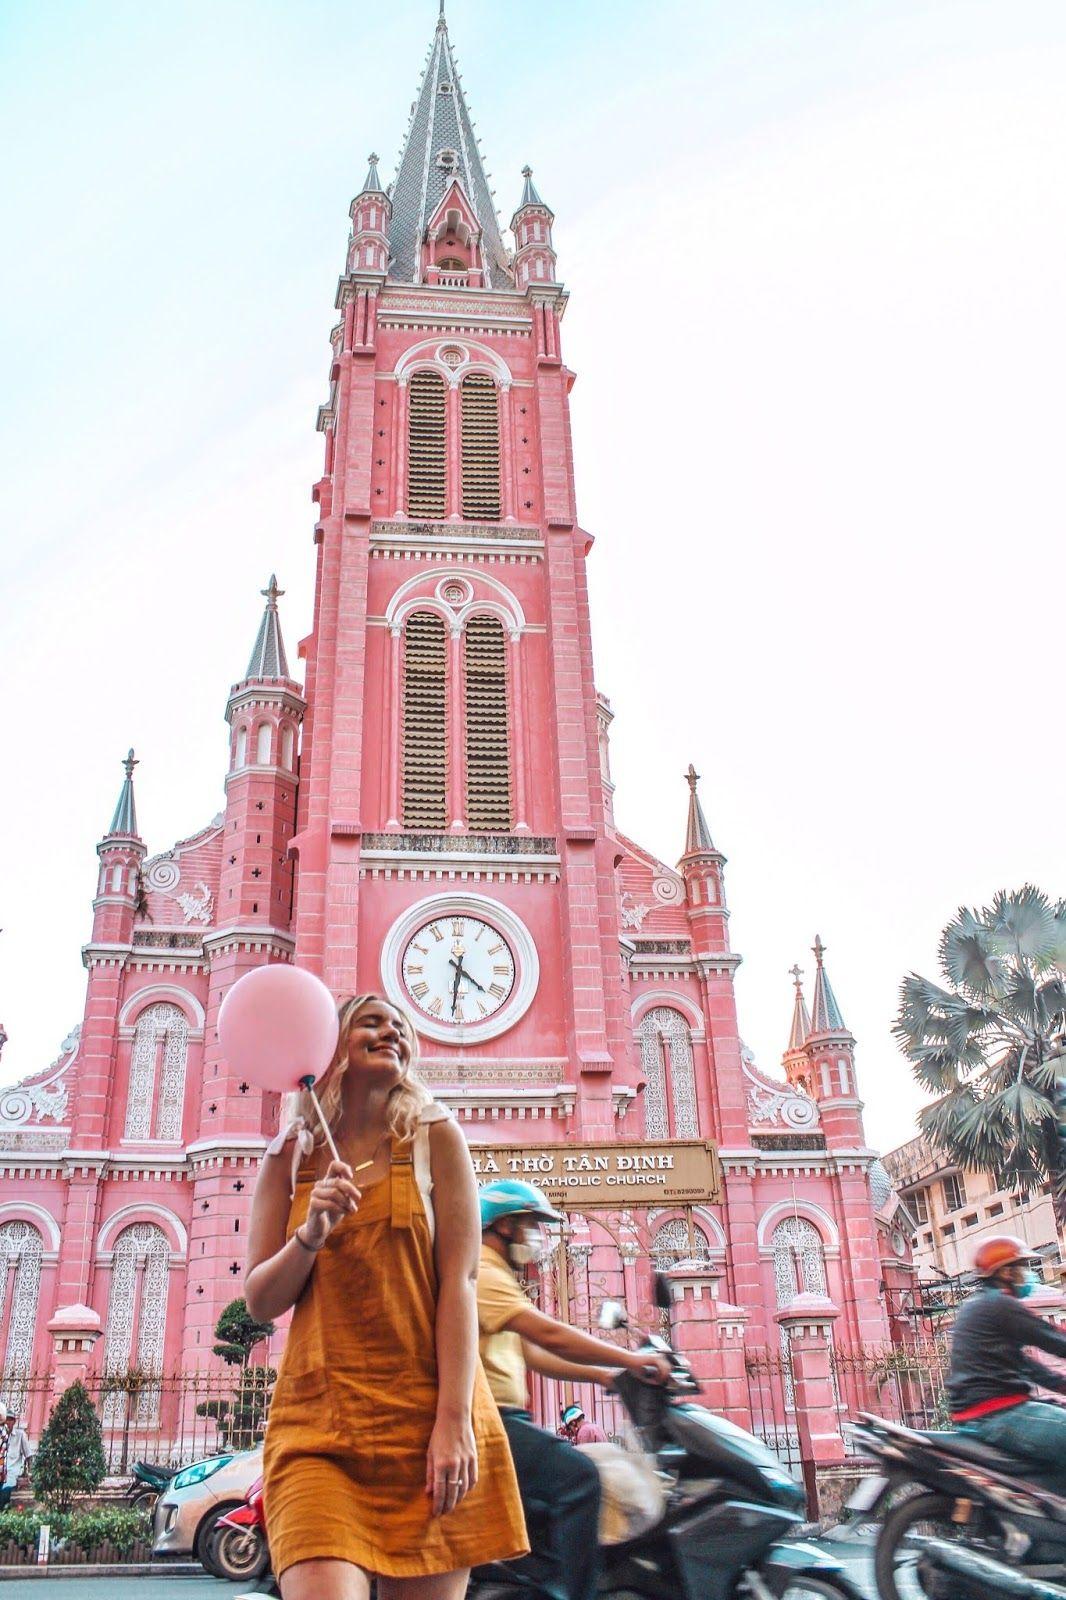 Pin By Yana Filonenko On Travel In 2020 Ho Chi Minh City Ho Chi Minh Walking Street